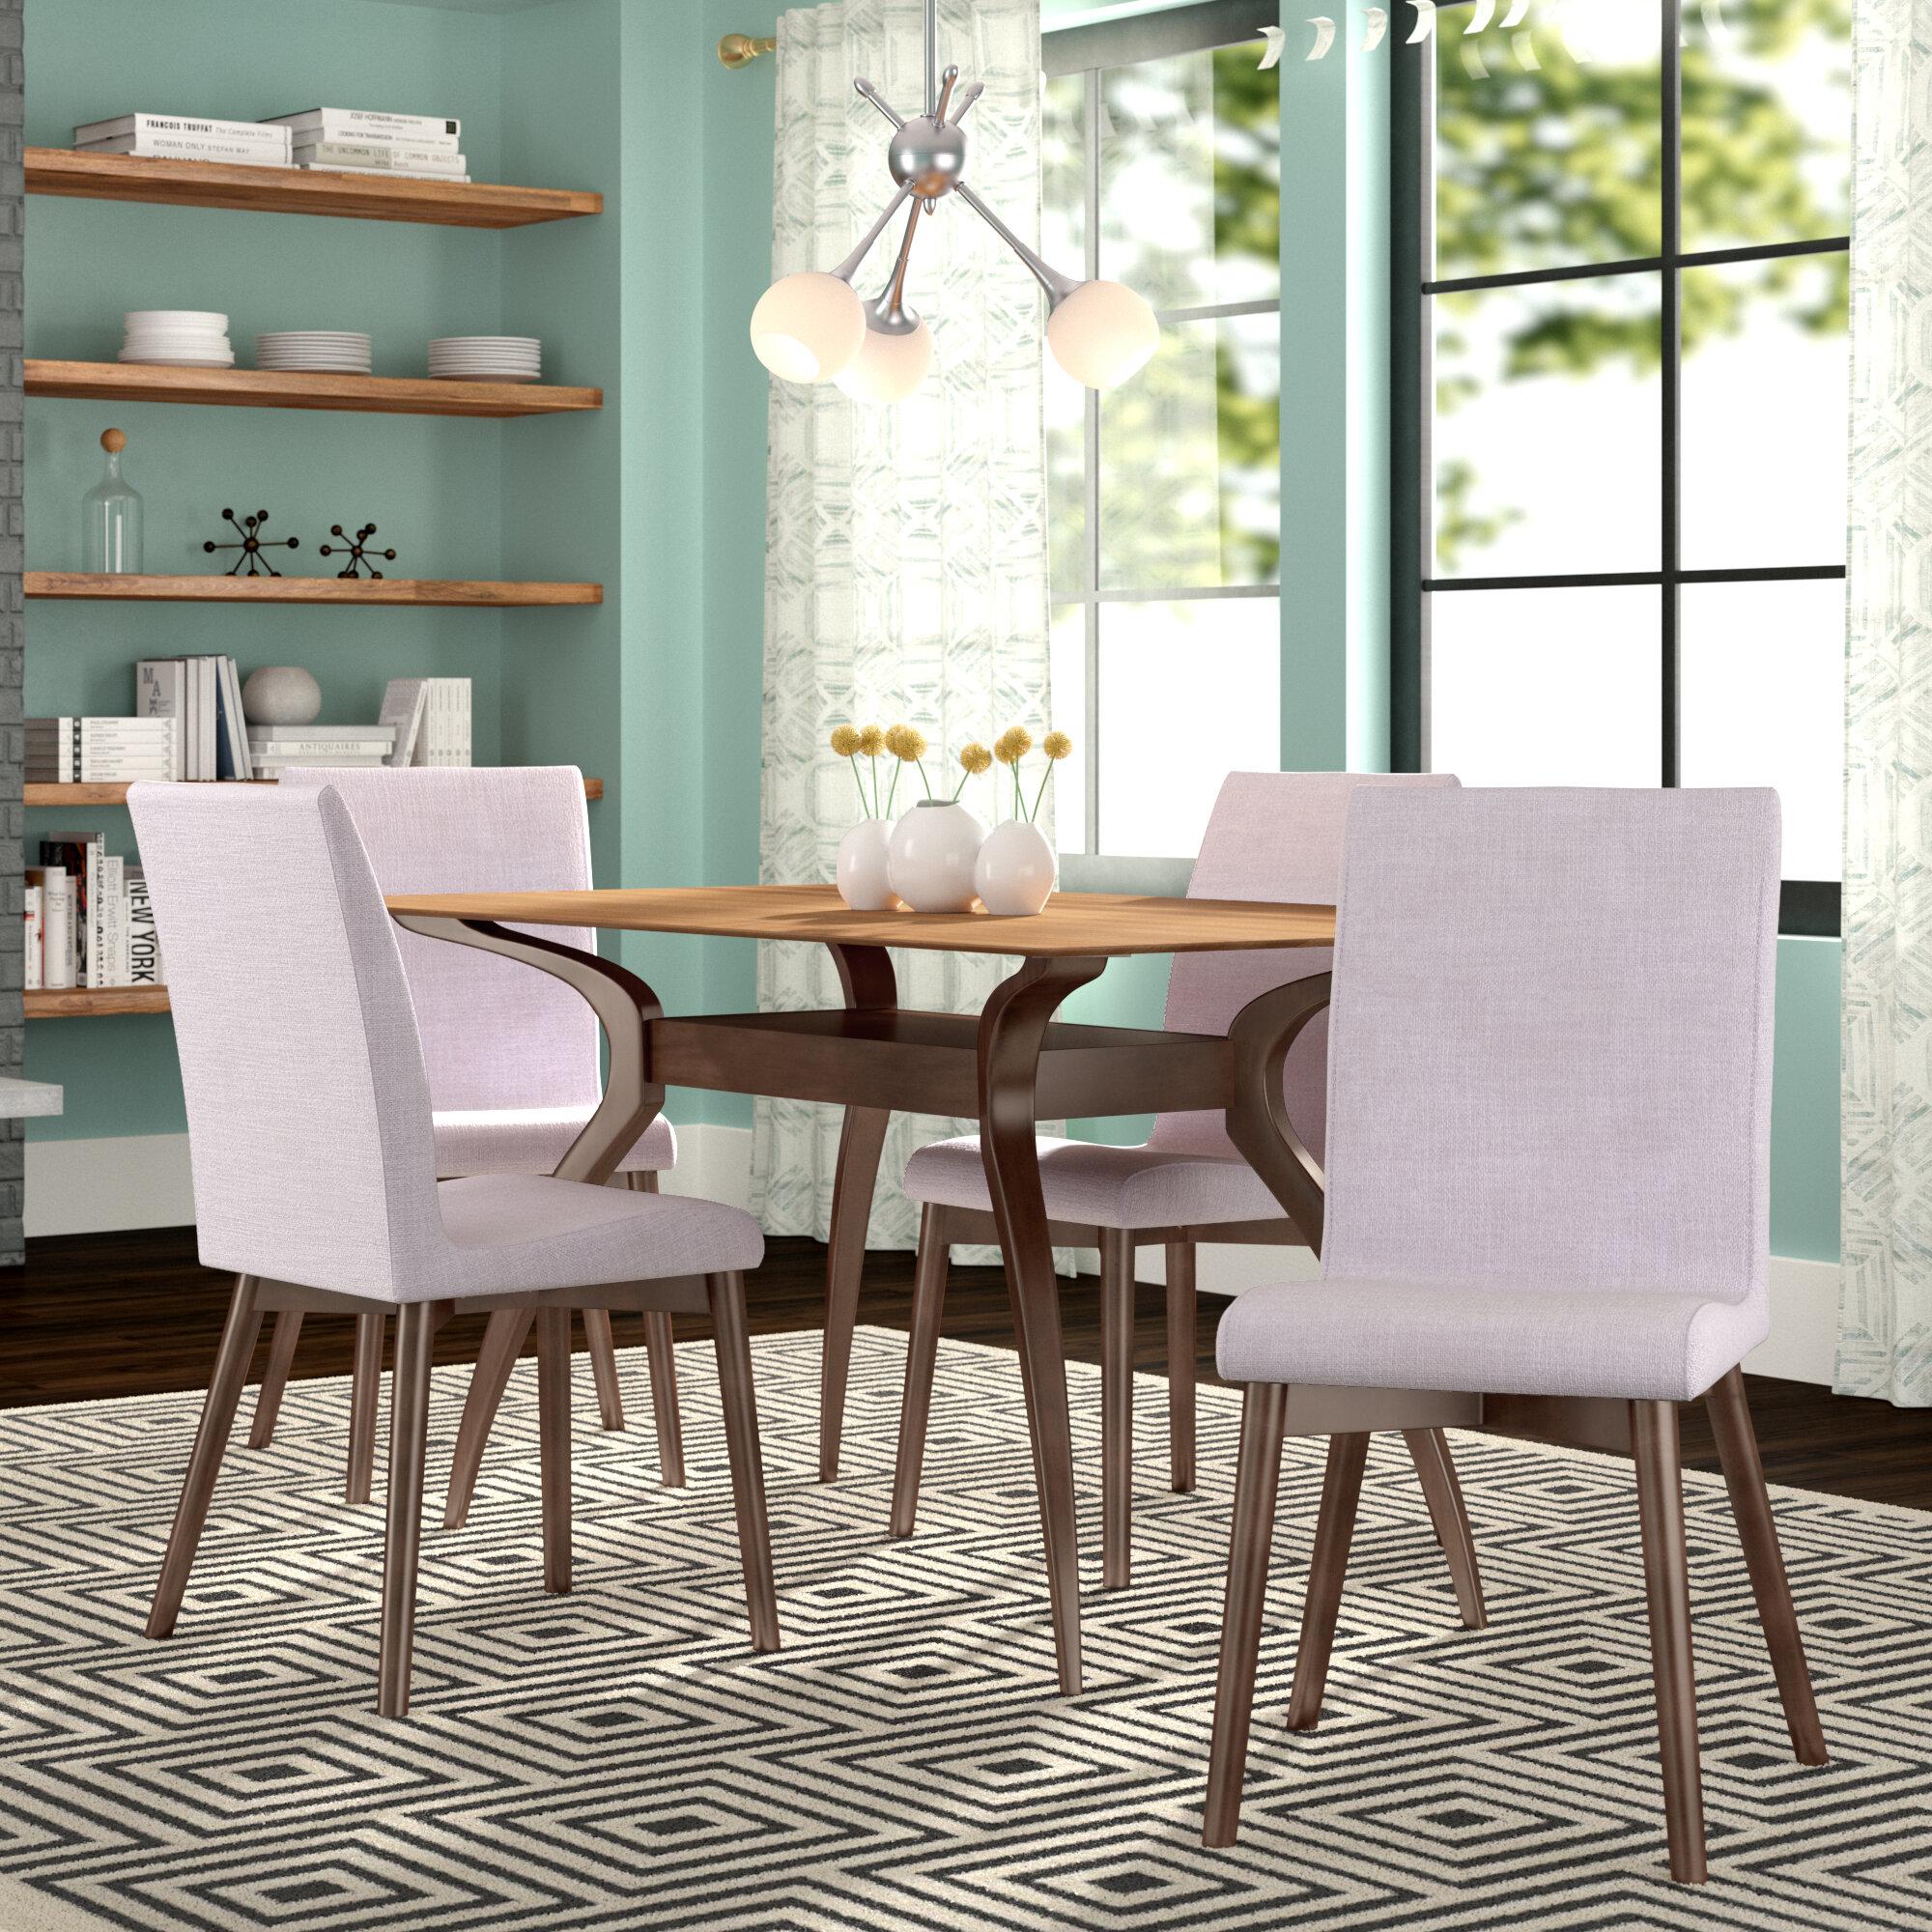 Liles 5 piece dining set reviews allmodern